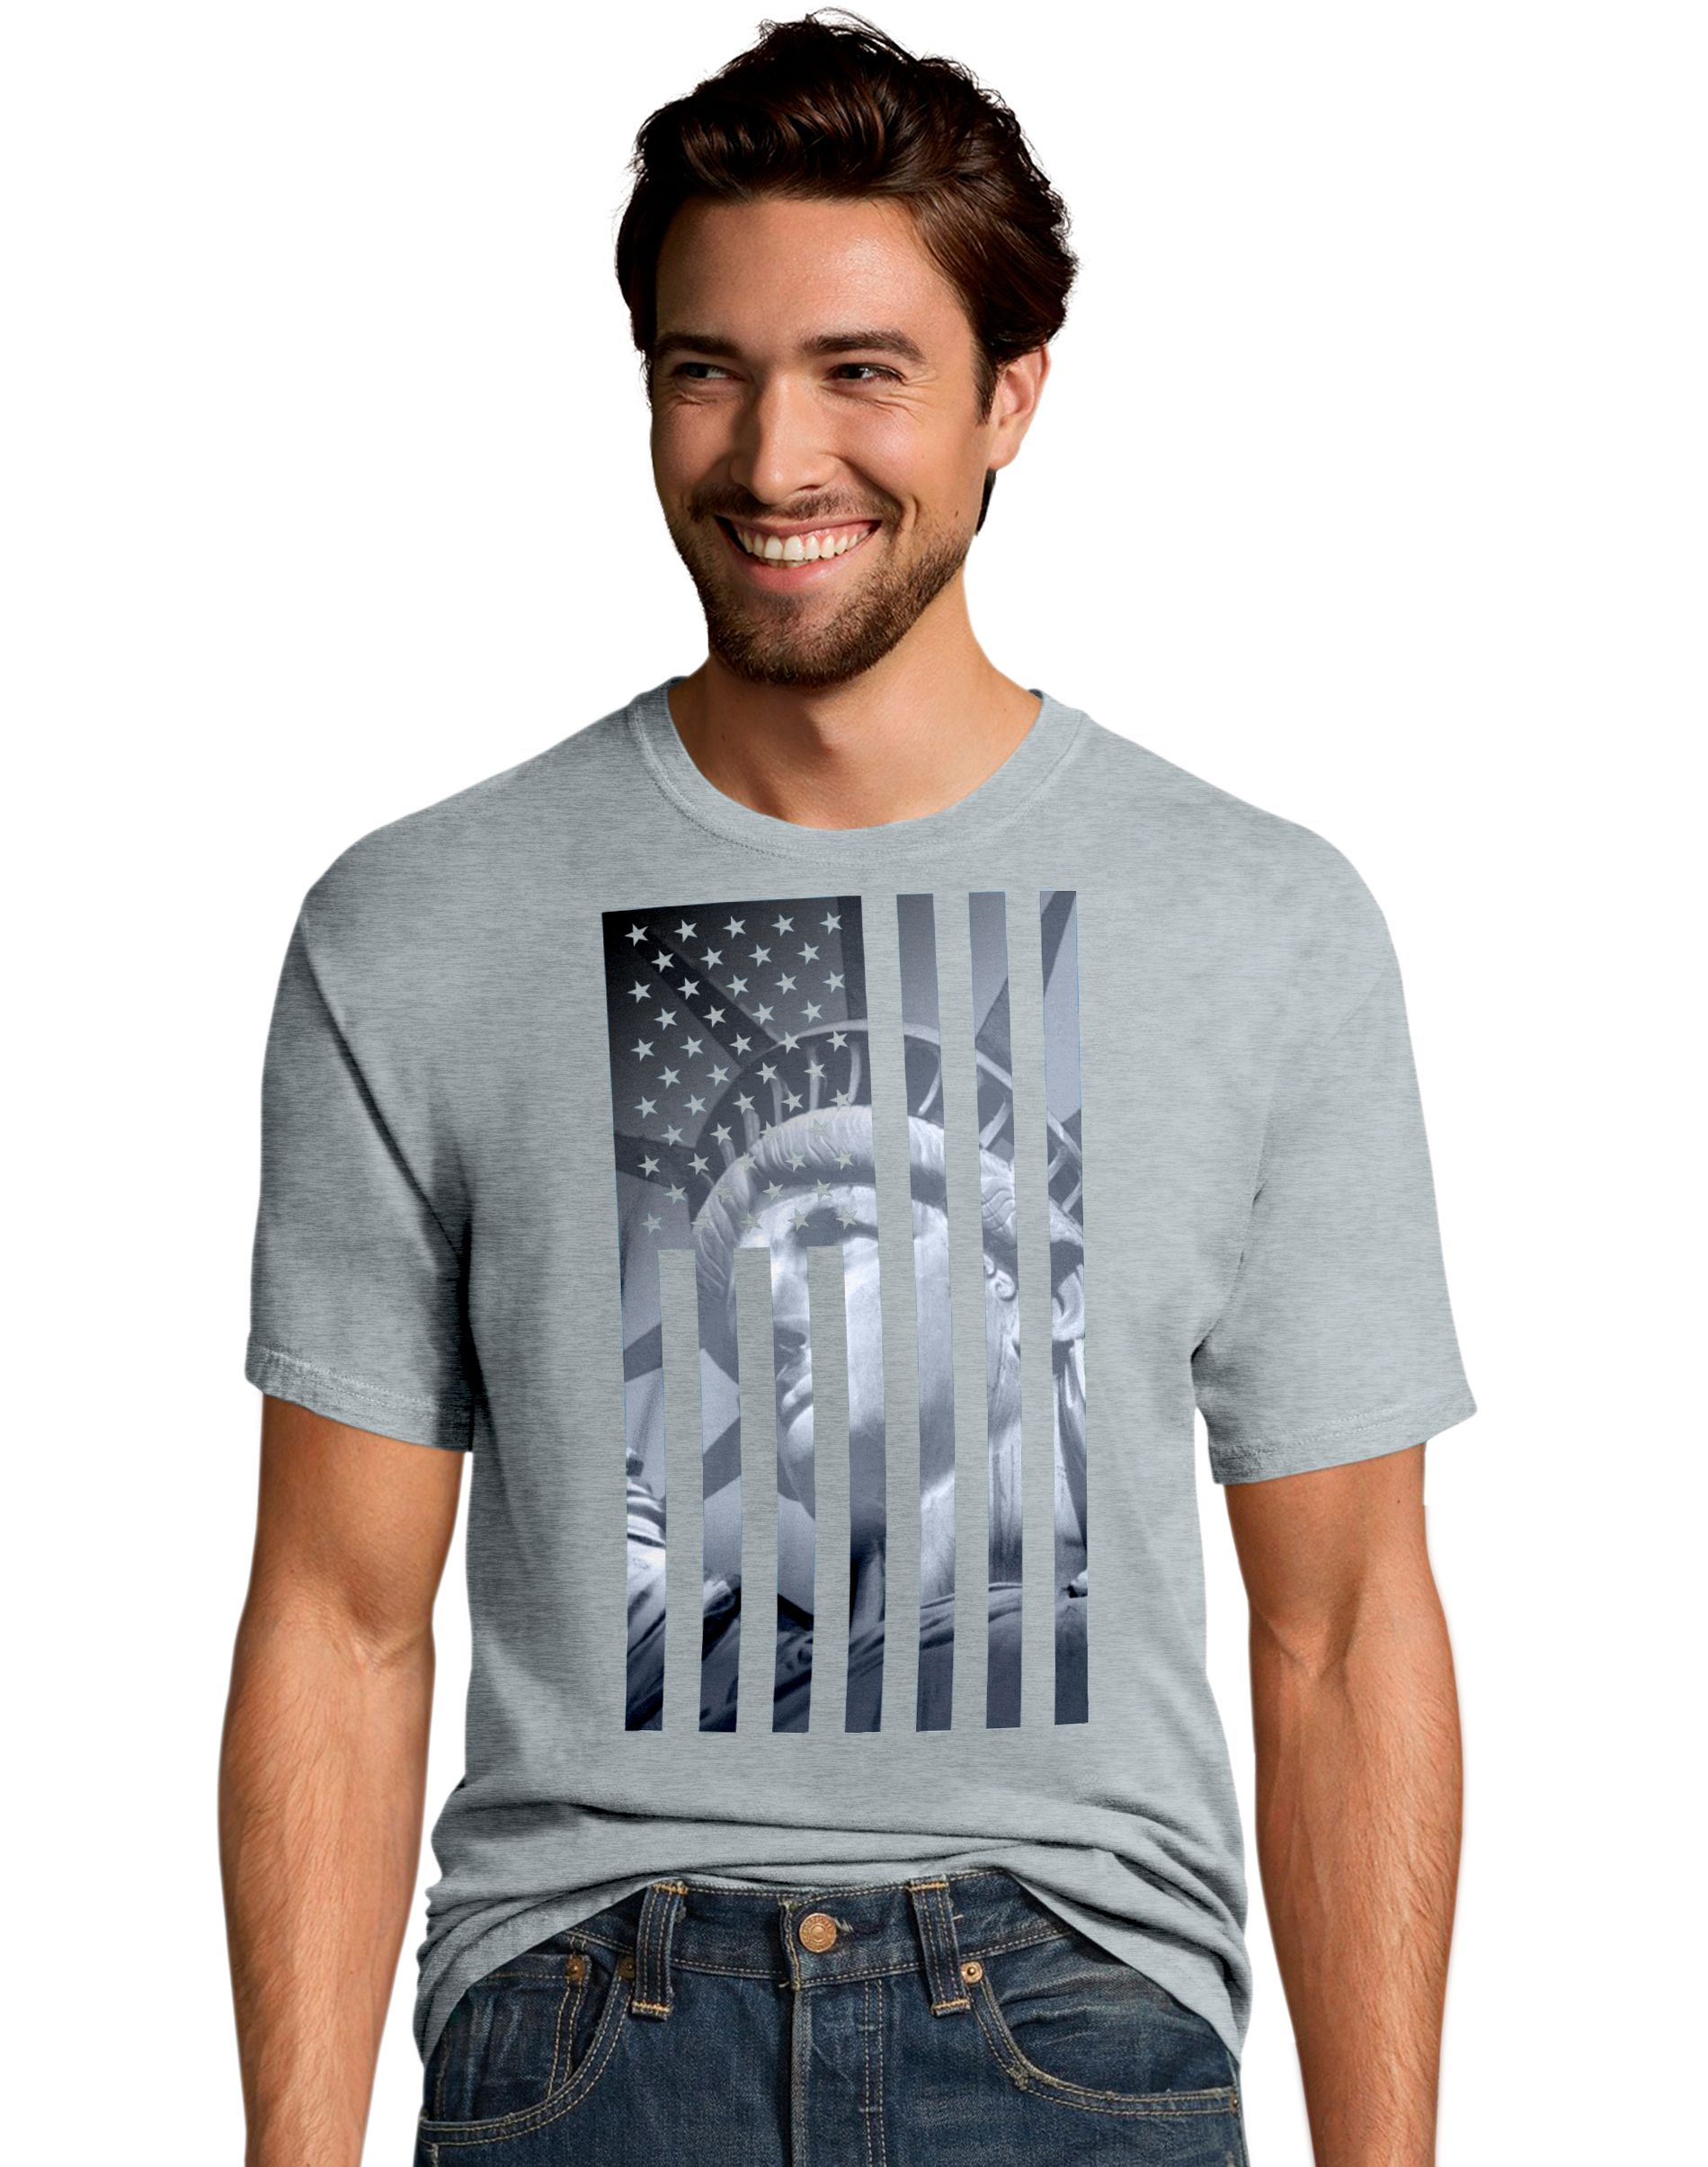 Men's Liberty Flag Graphic Tee men Hanes